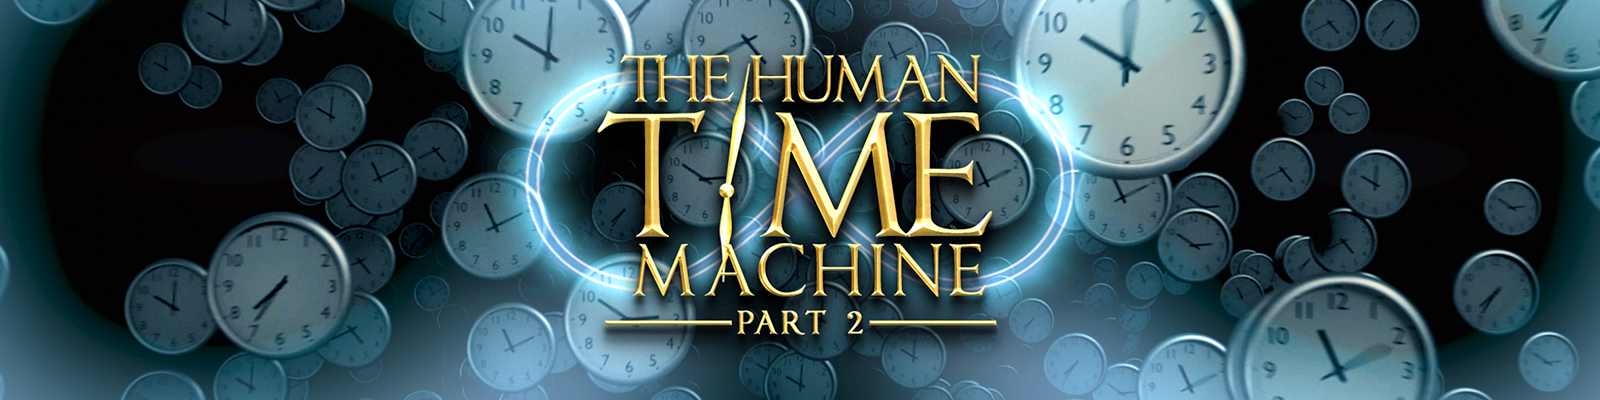 Human Time Machine